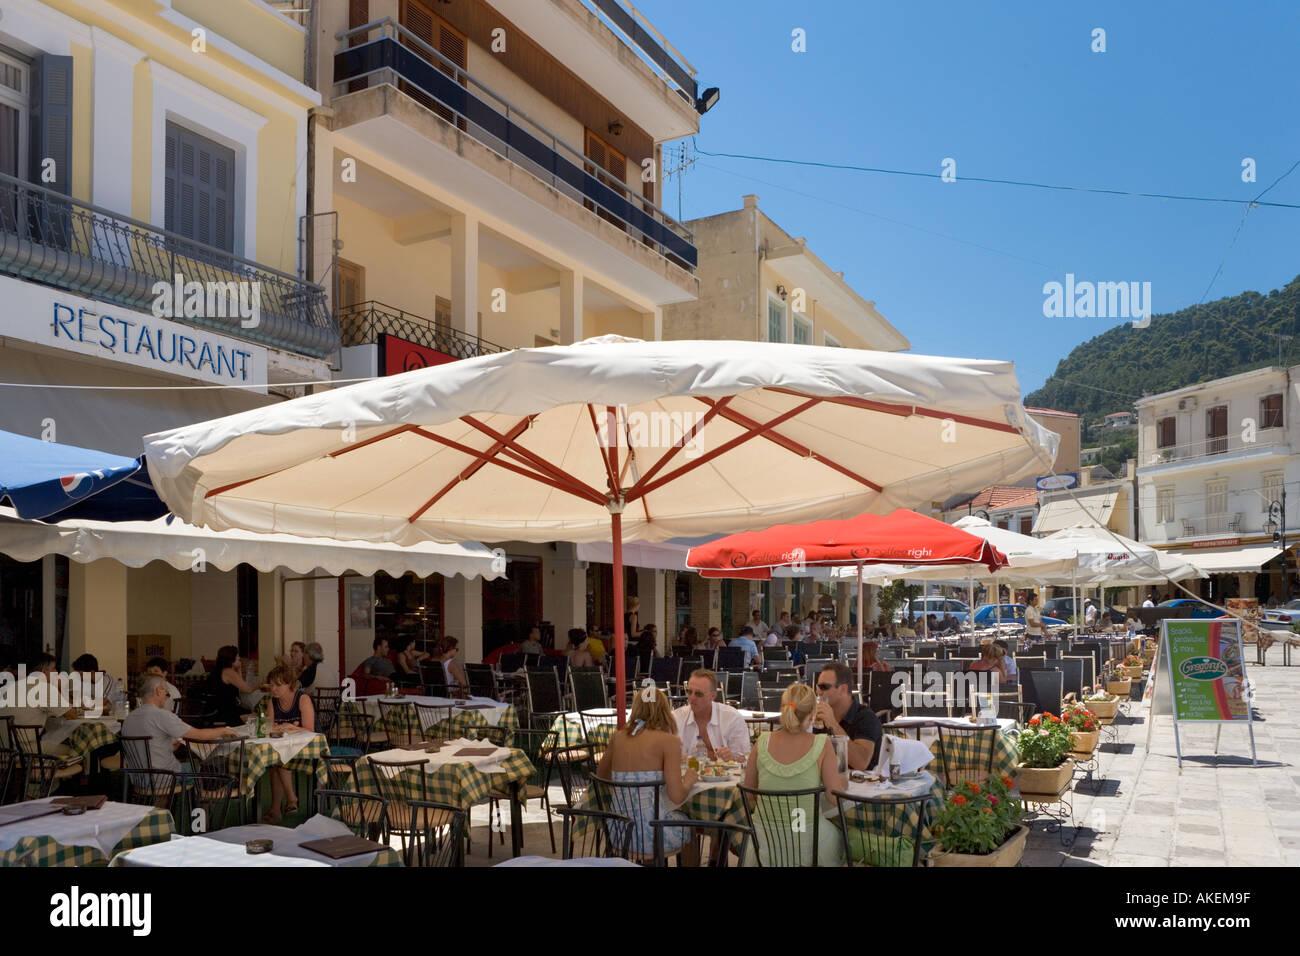 Restaurants, St Mark's Square (Aghios Markou Sq),  Zakynthos Town, Zakynthos, Ionian Islands, Greece Stock Photo